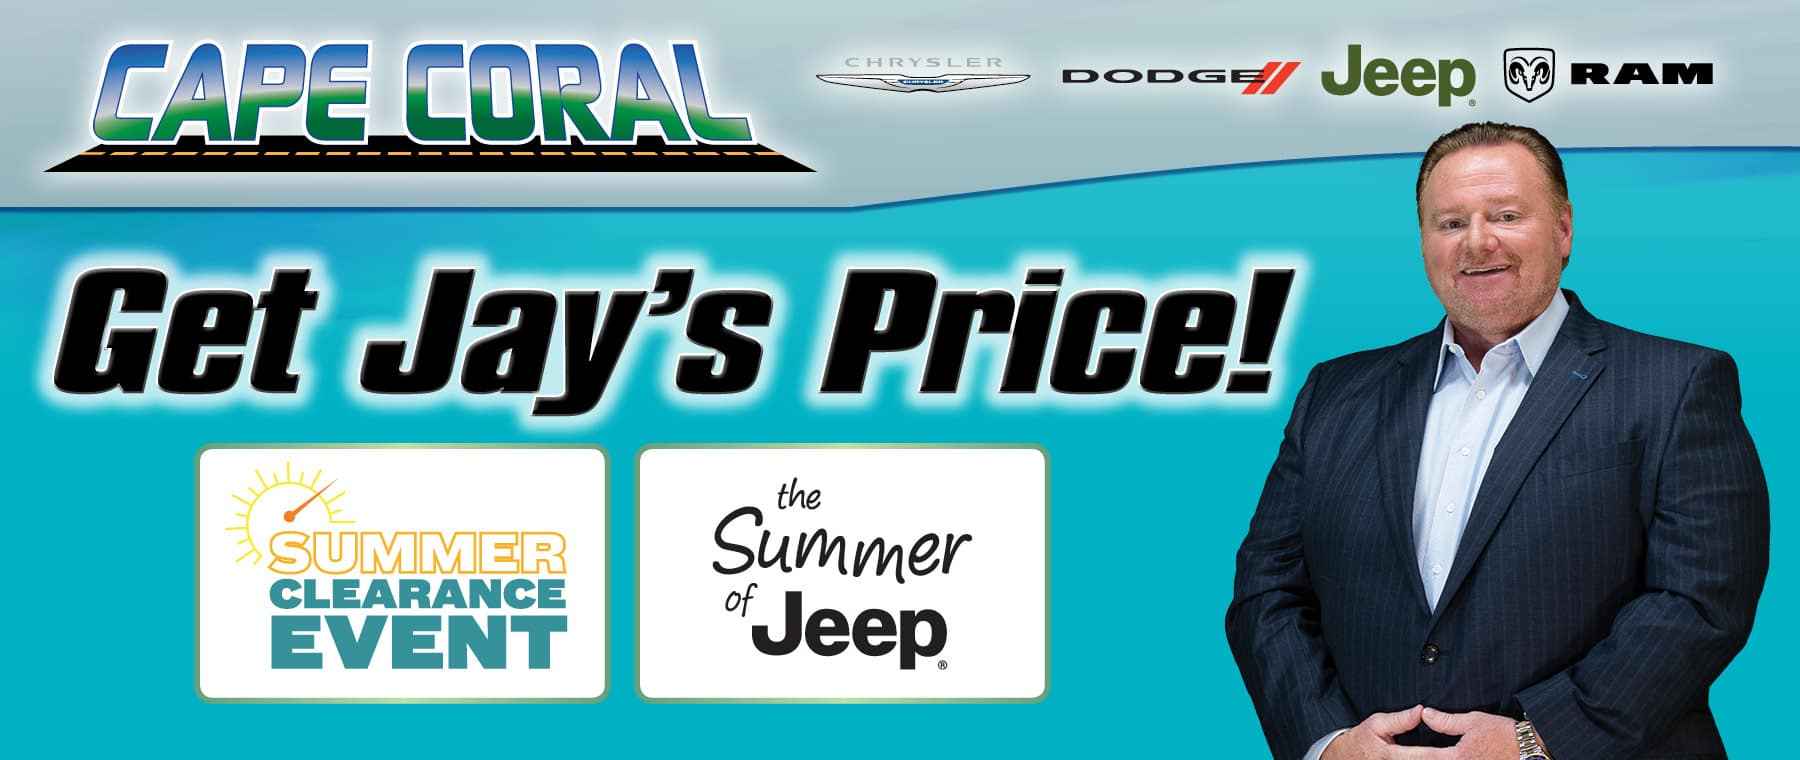 Get Jay's Price!